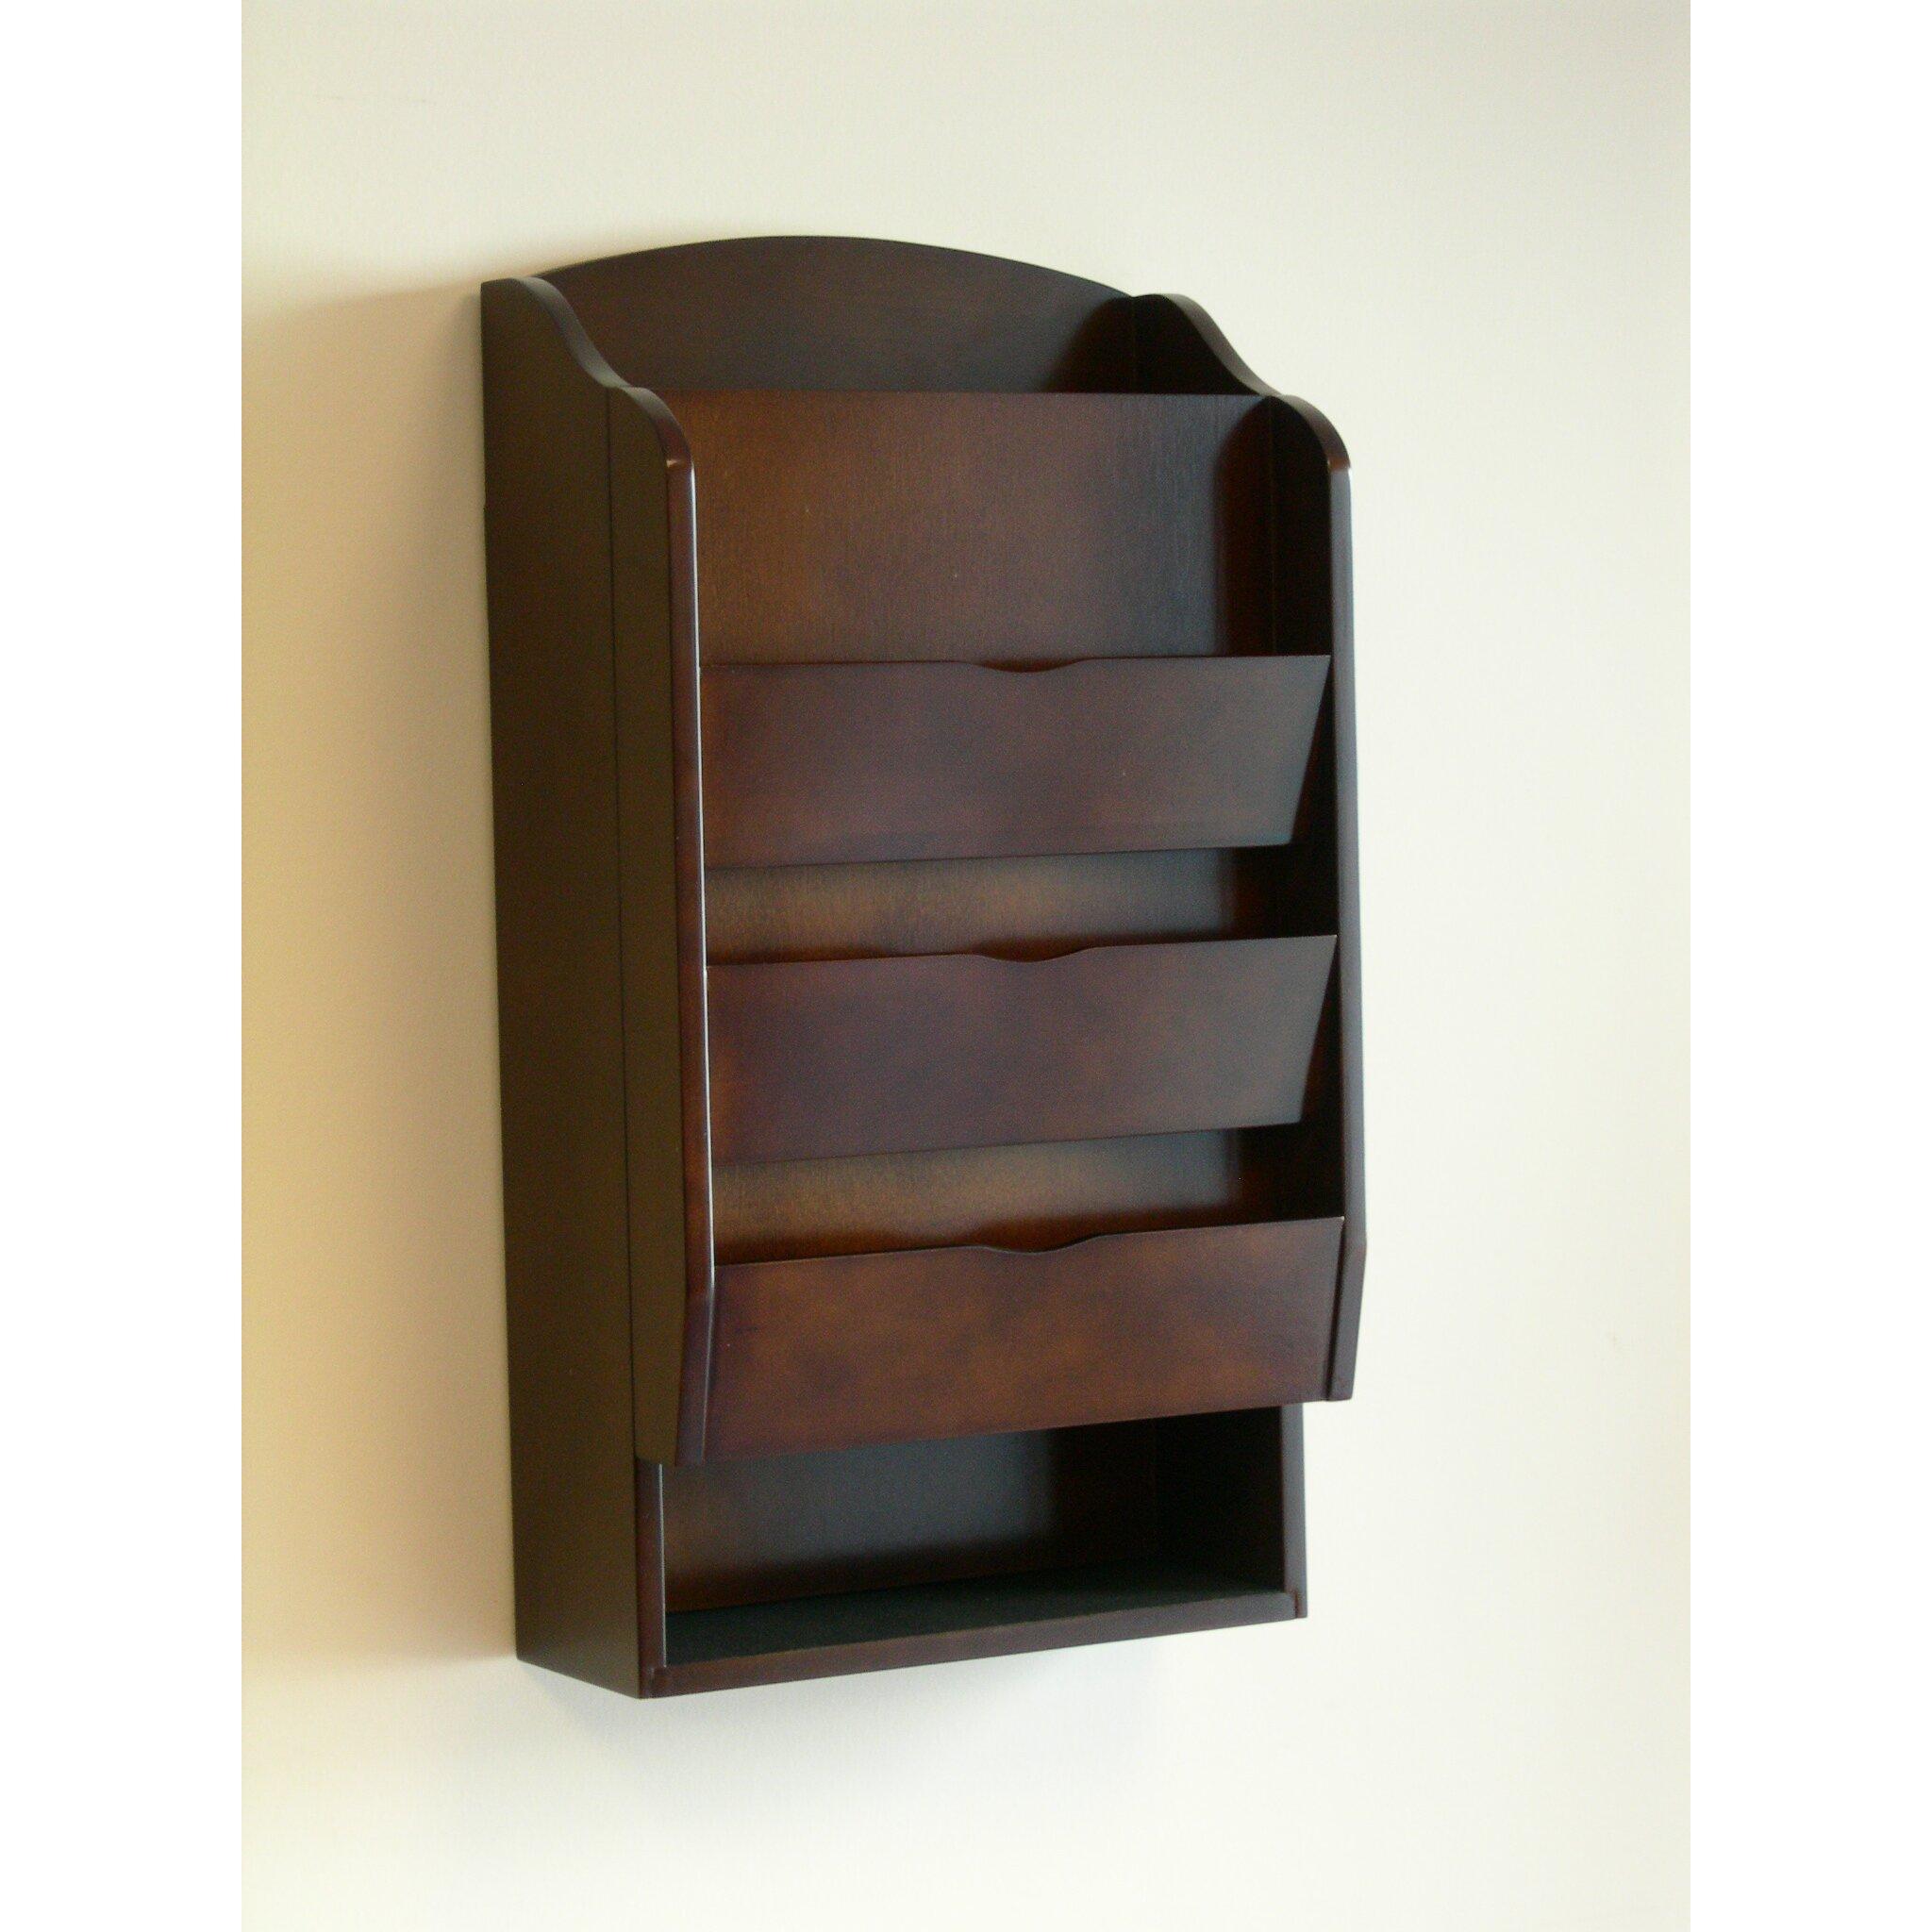 proman door entry organizer with mail sorter in dark. Black Bedroom Furniture Sets. Home Design Ideas